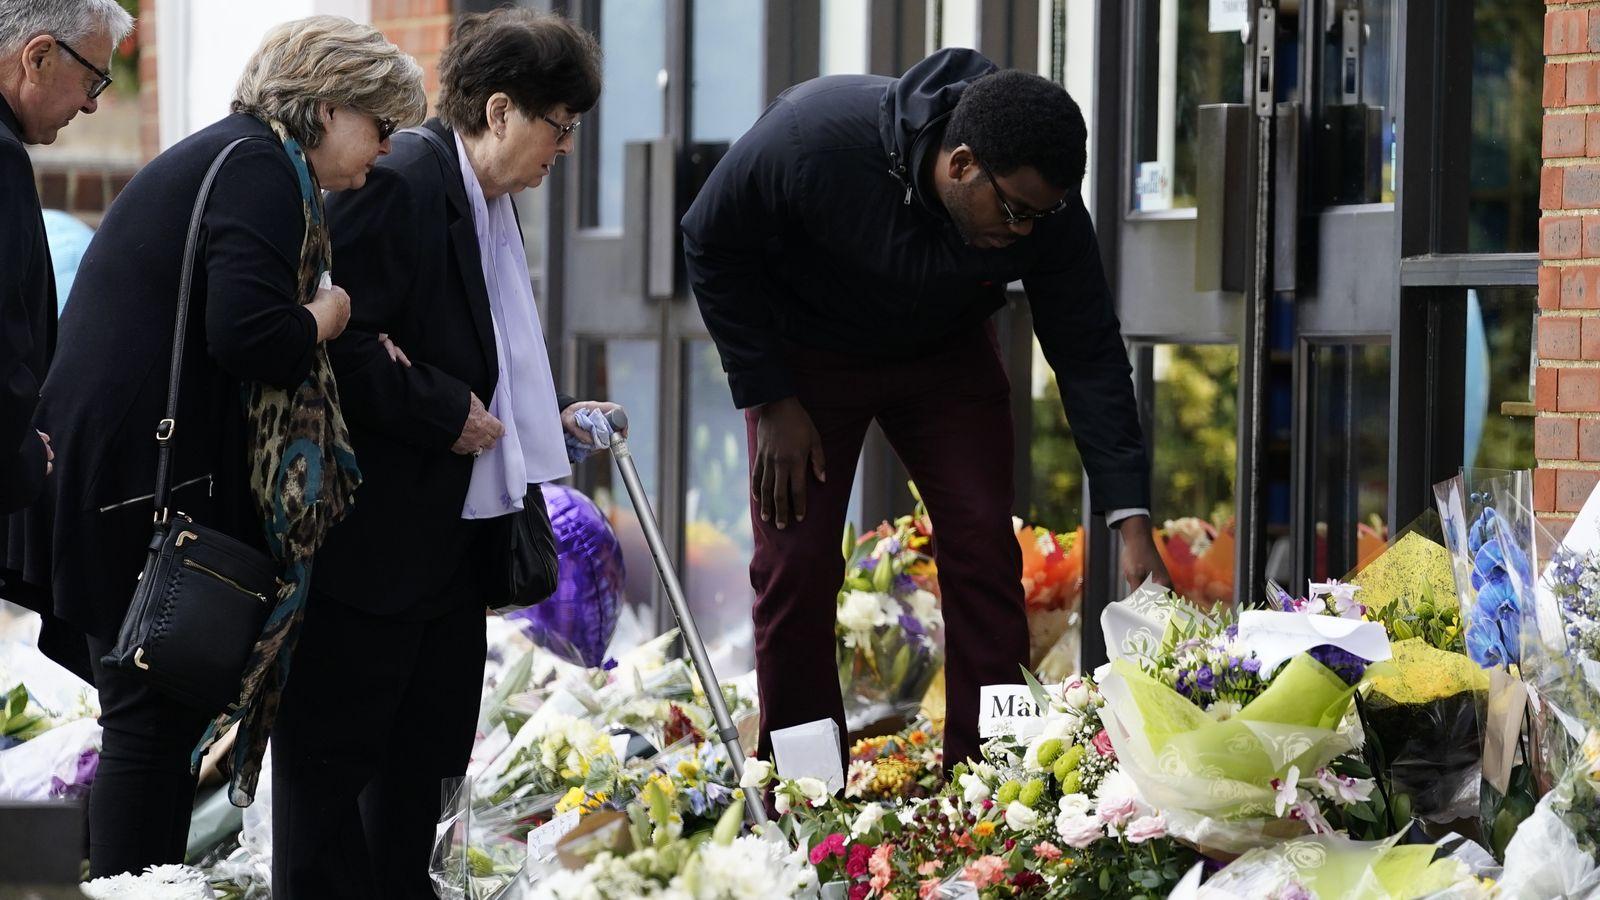 Sir David Amess murder: MP's family visit church where he was killed